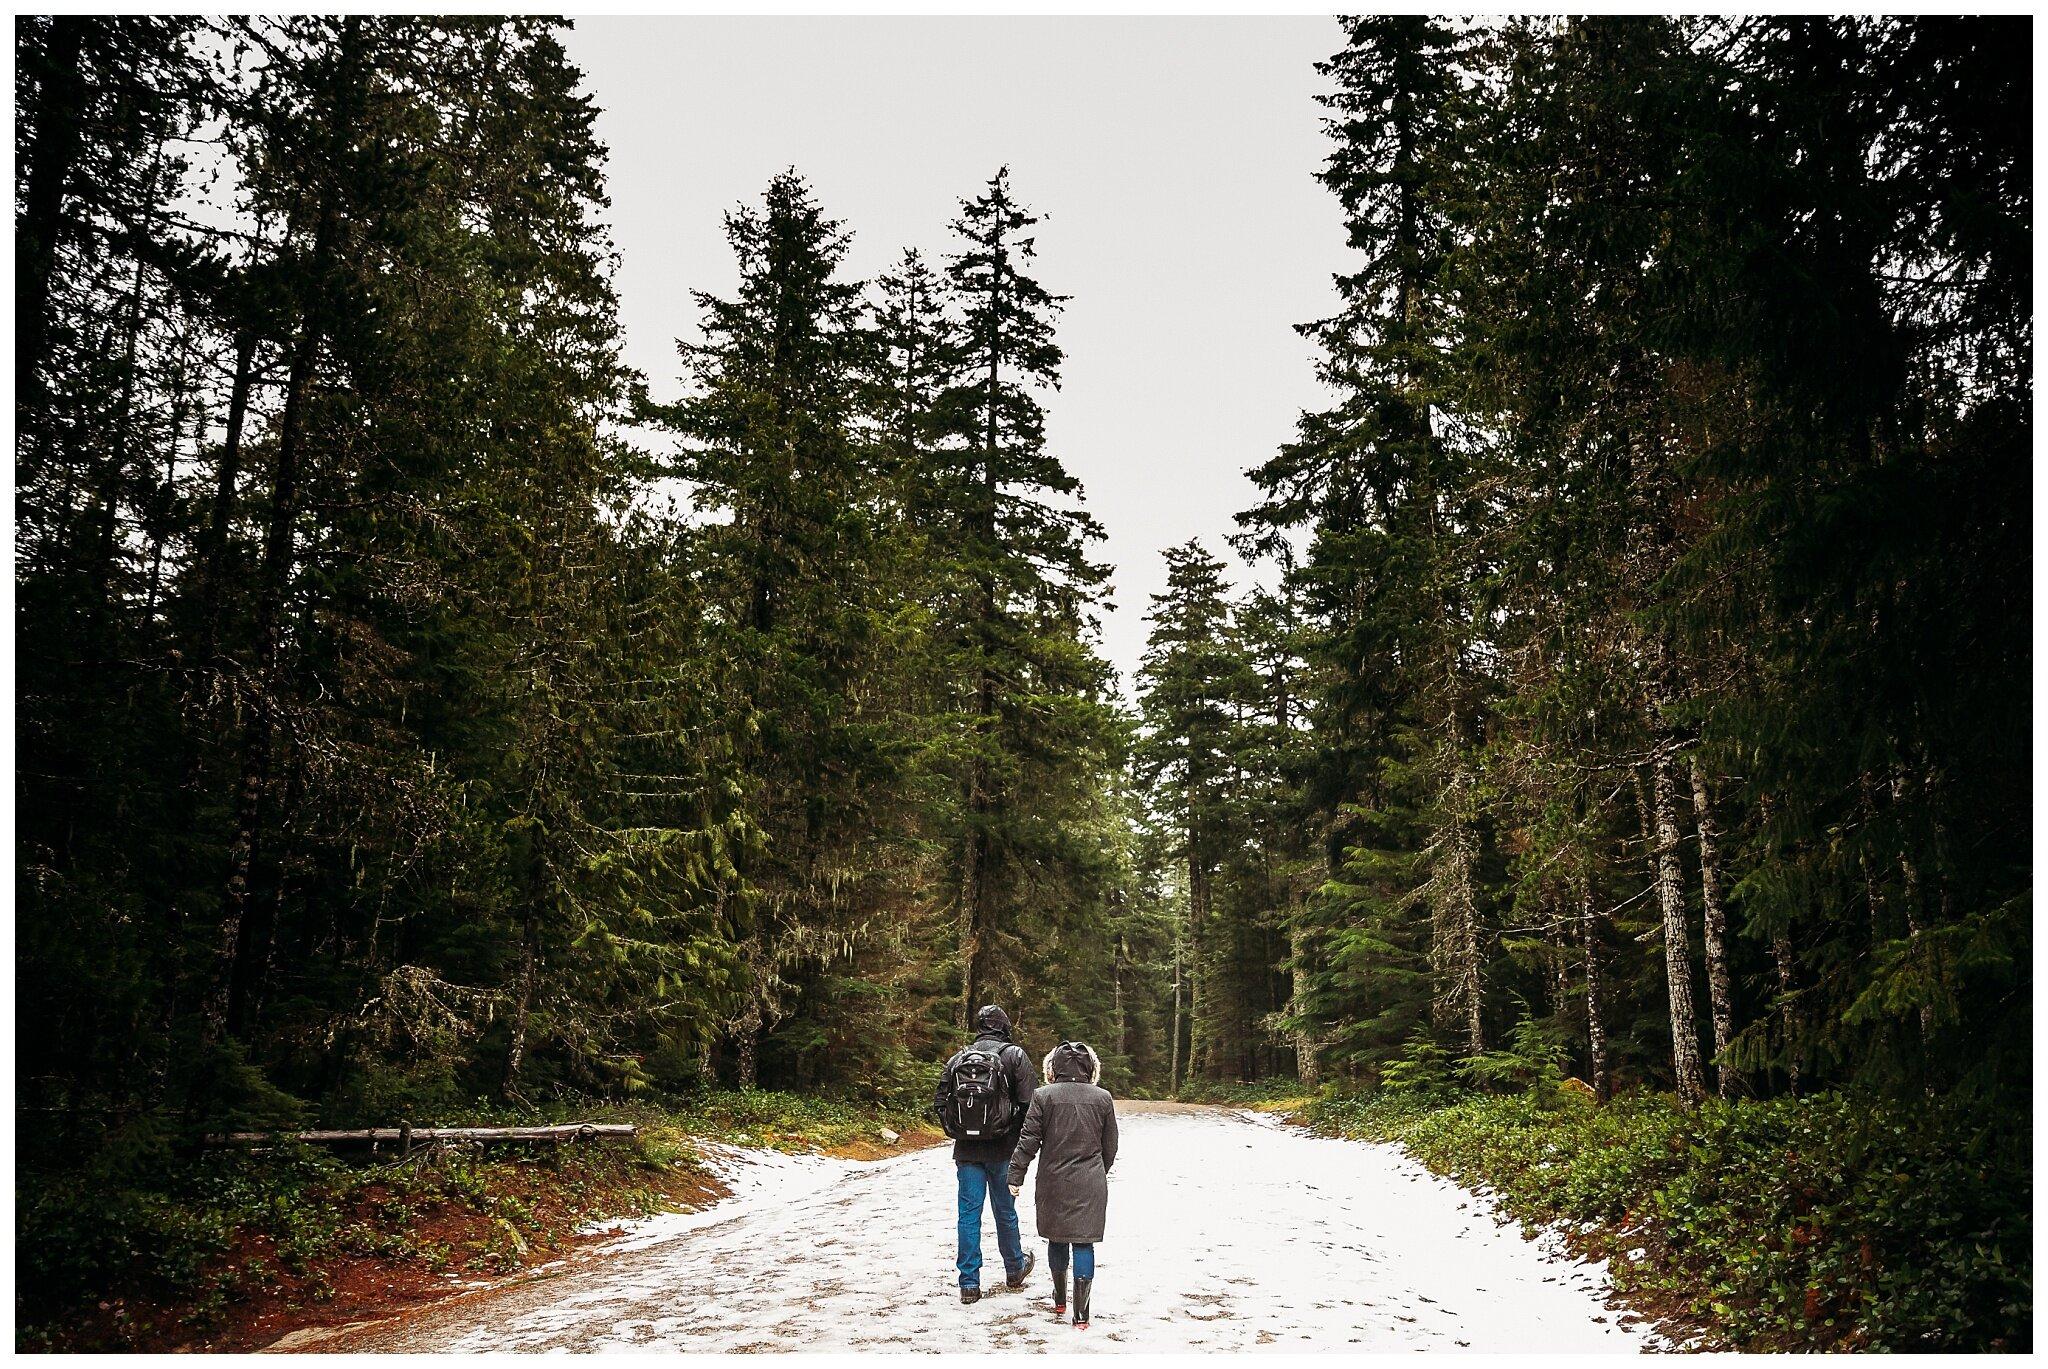 Chilliwack Lake Rainy Winter Engagement Photography Session Couples Photographer_0014.jpg